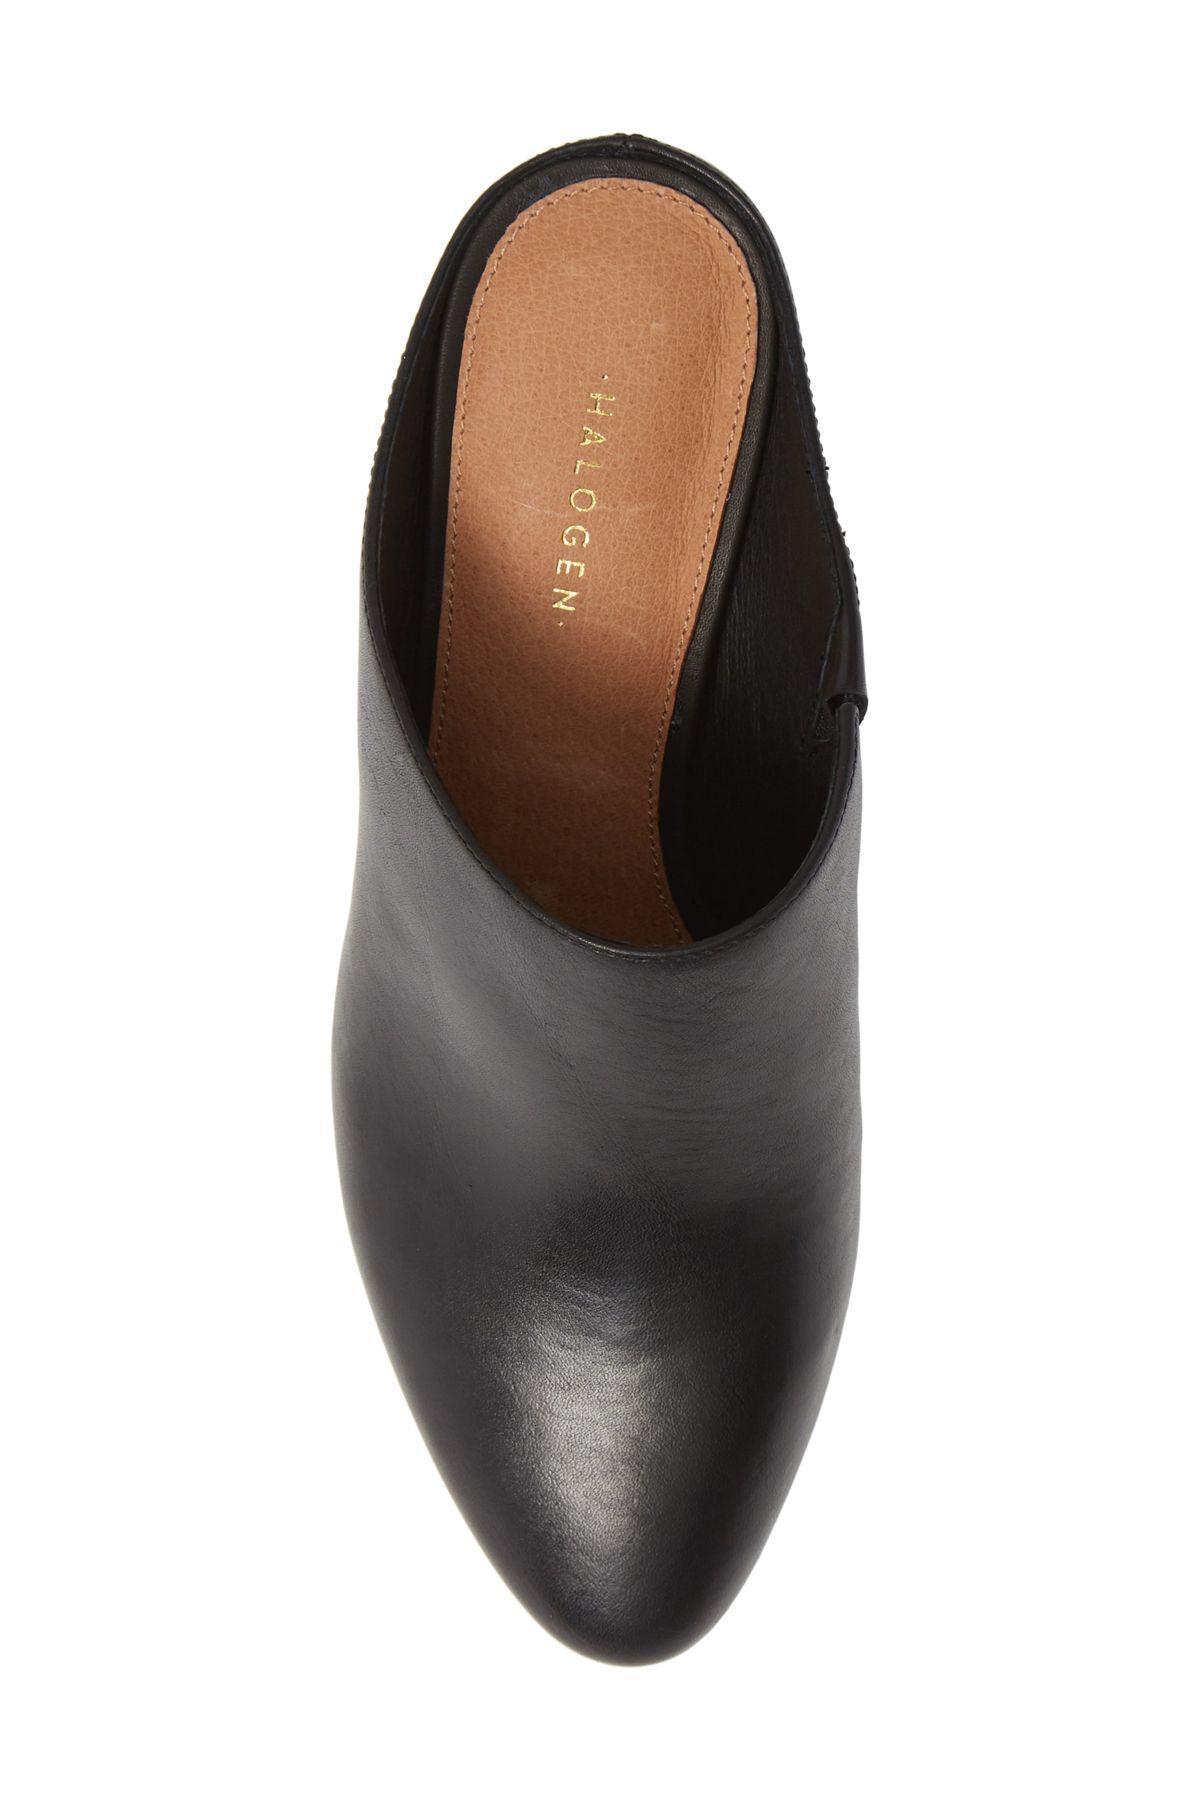 Halogen Brielle Mule in Black Leather